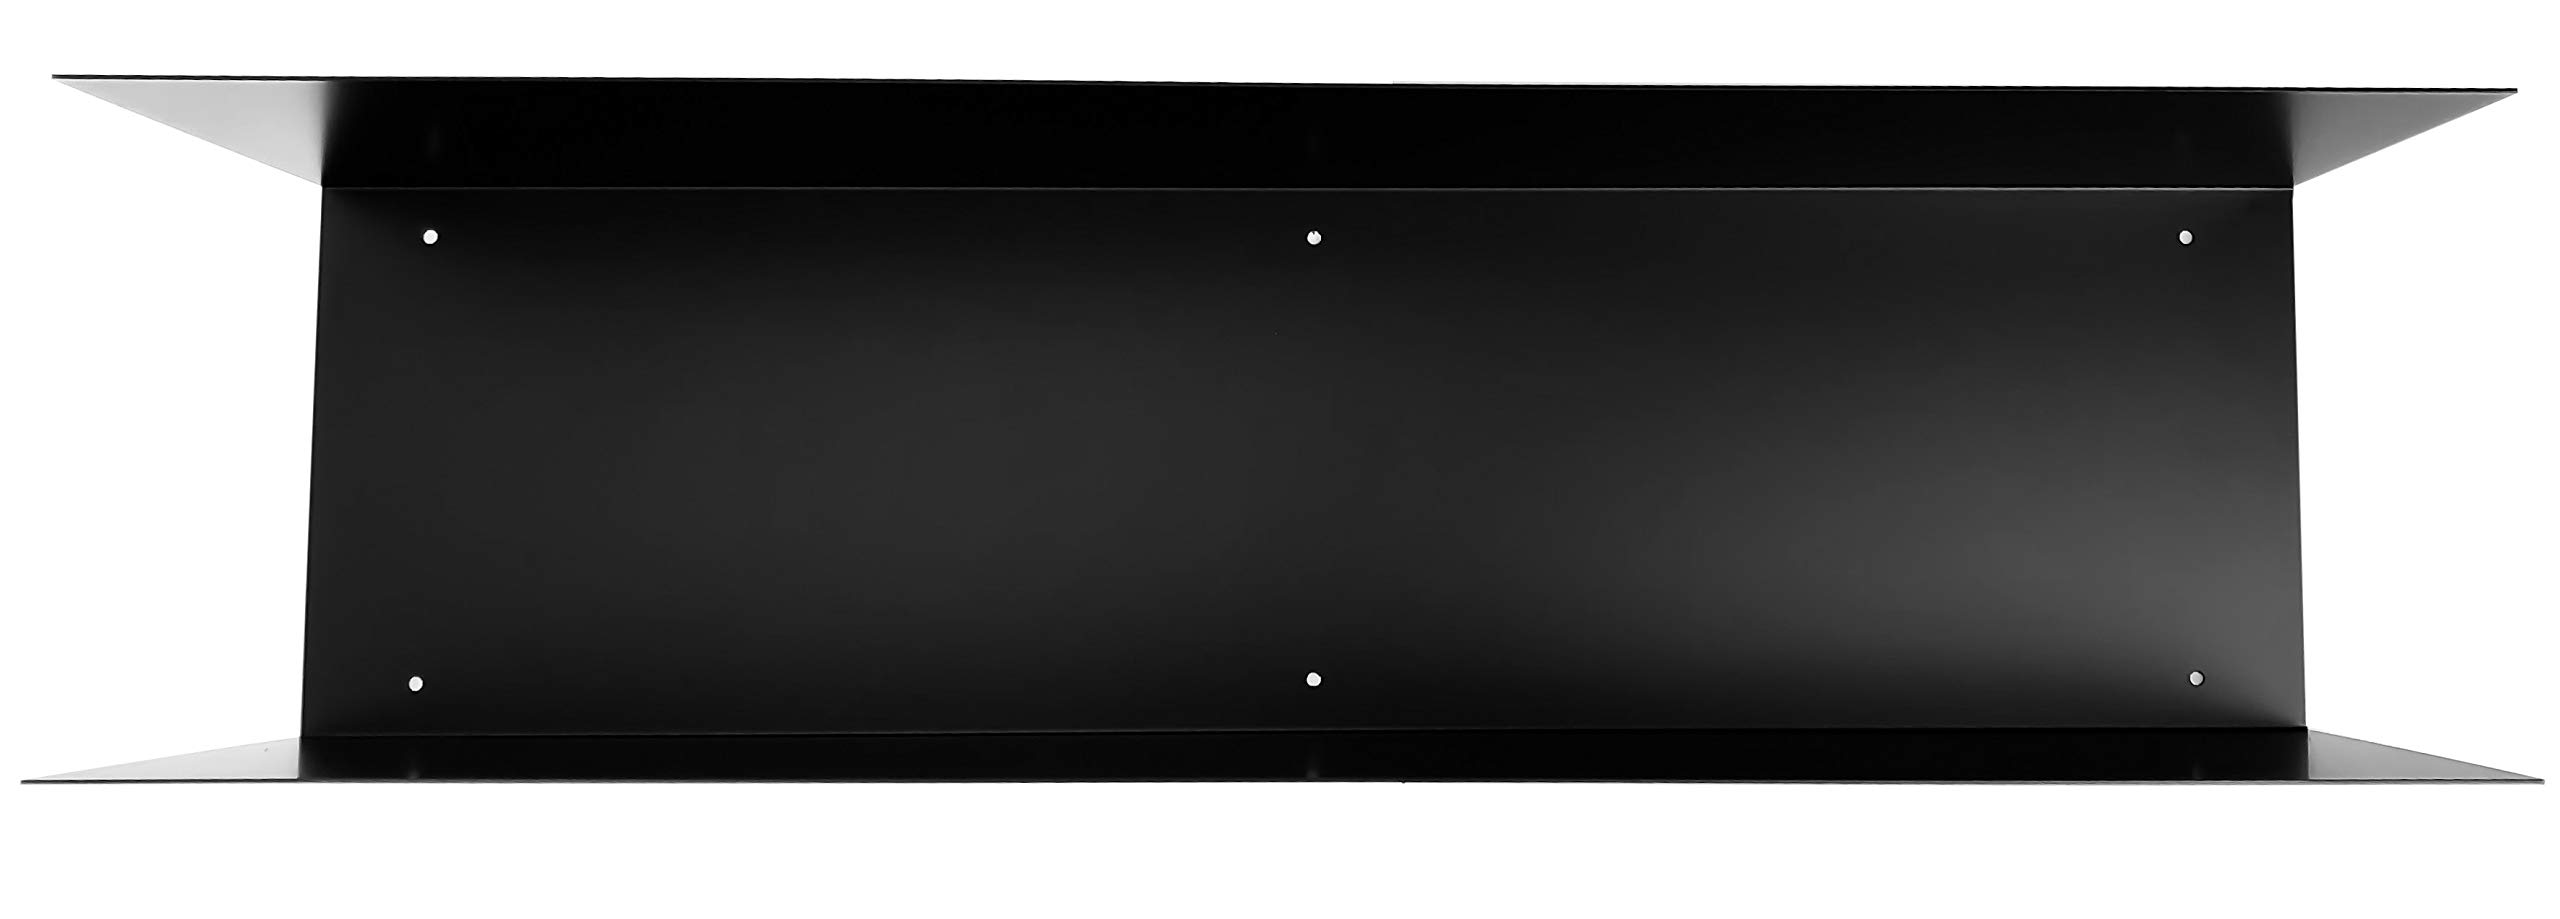 DIY CARTEL Floating U/C Shelf - Made in The USA from Raw Forged Steel - Professionally Powder Coated Black - Industrial Heavy Duty Metal - Wall Mounted Modern Minimal Scandinavian Botkyrka Shelf